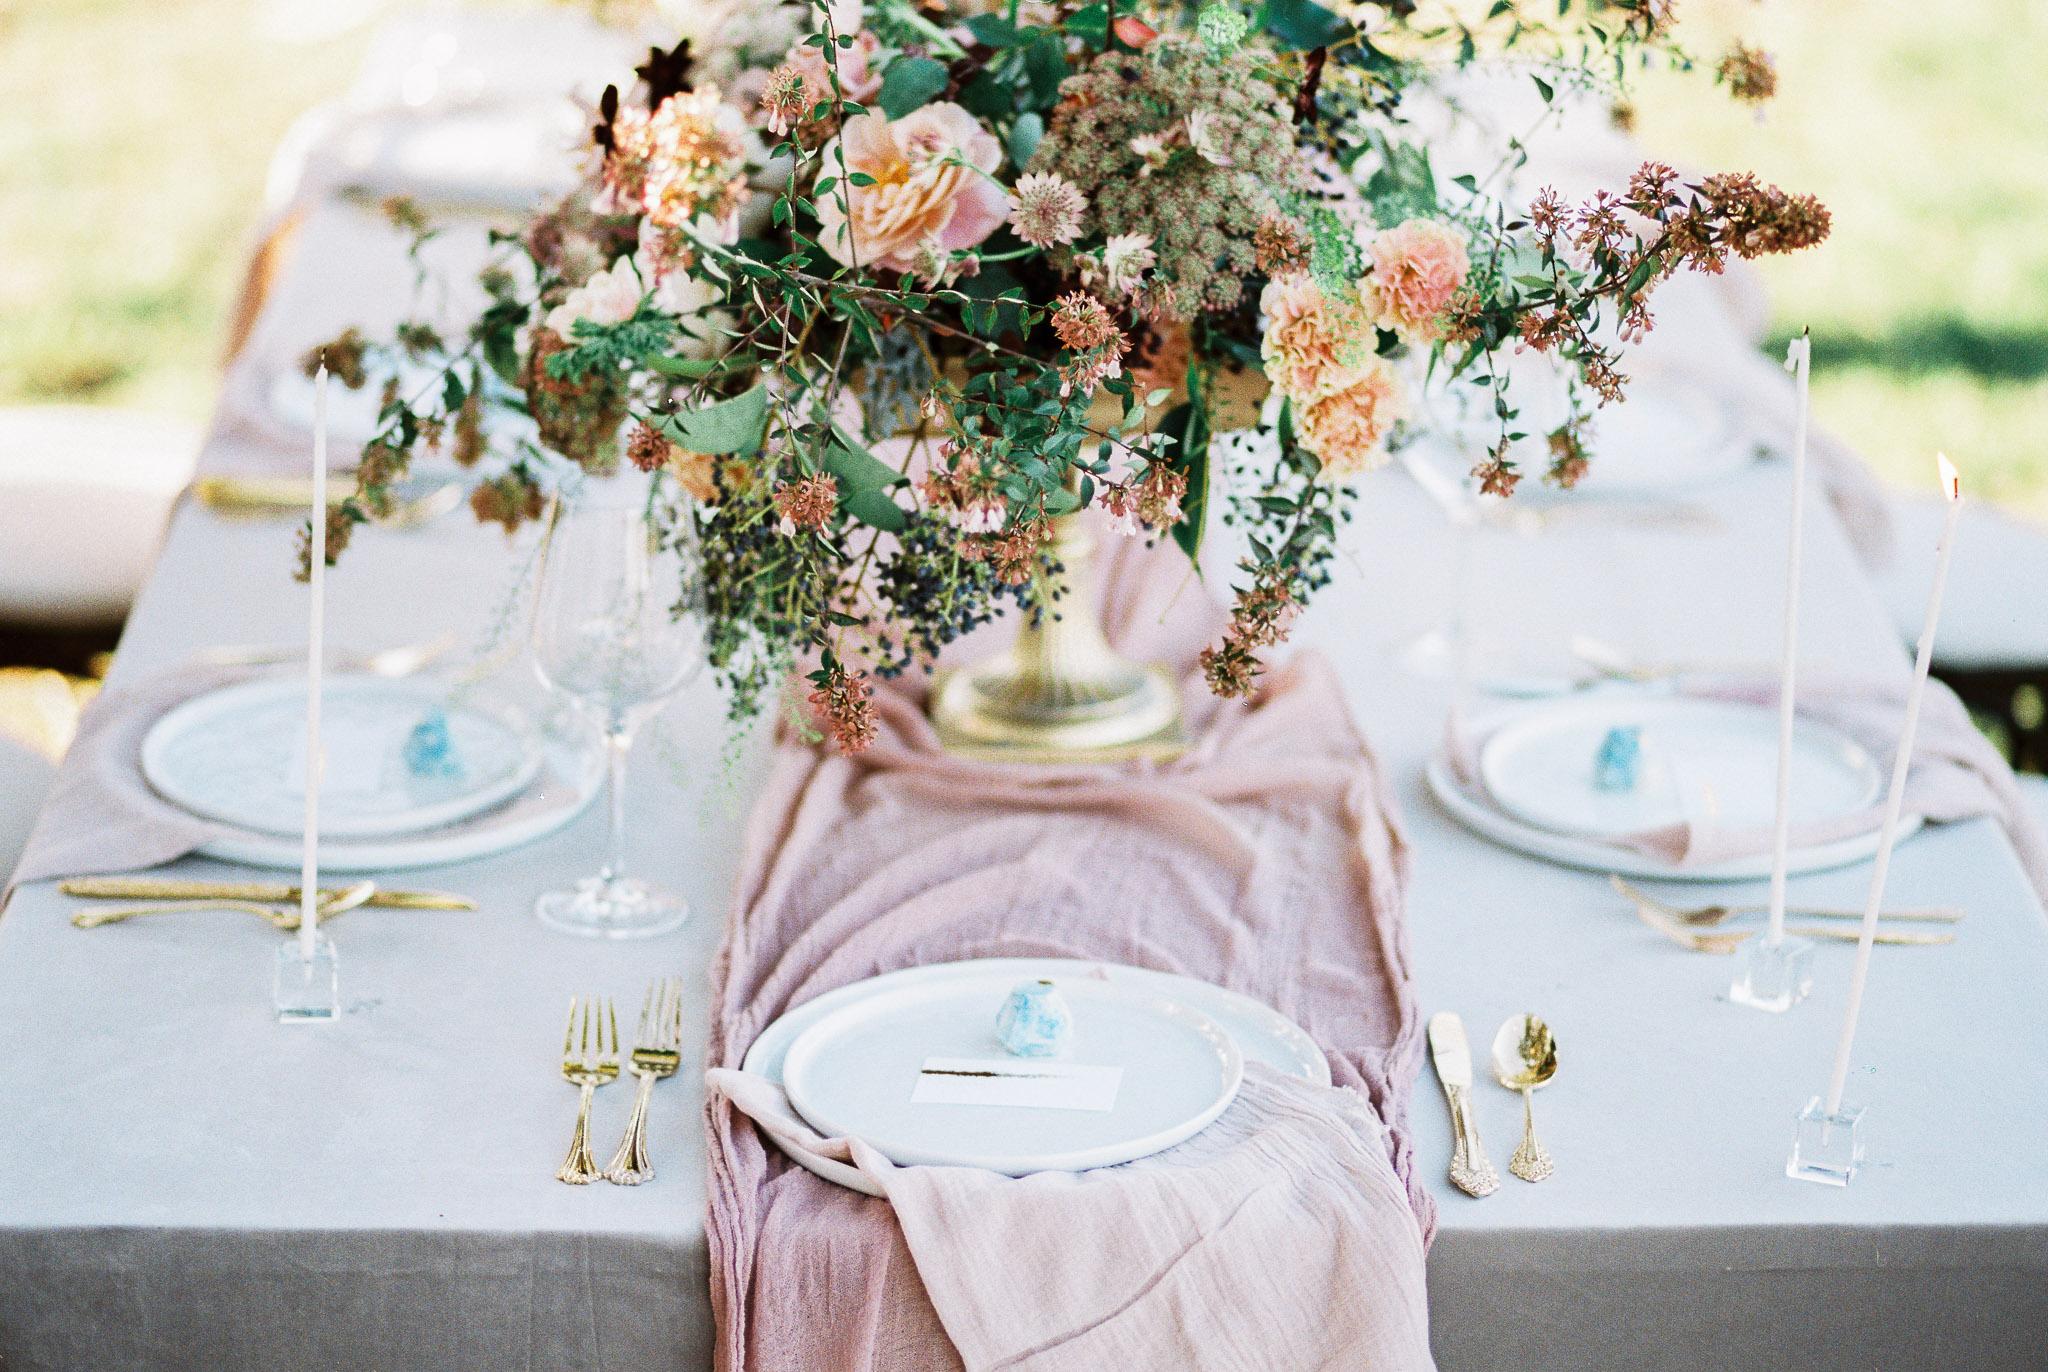 pop-the-cork-planning-wedding-tablescape